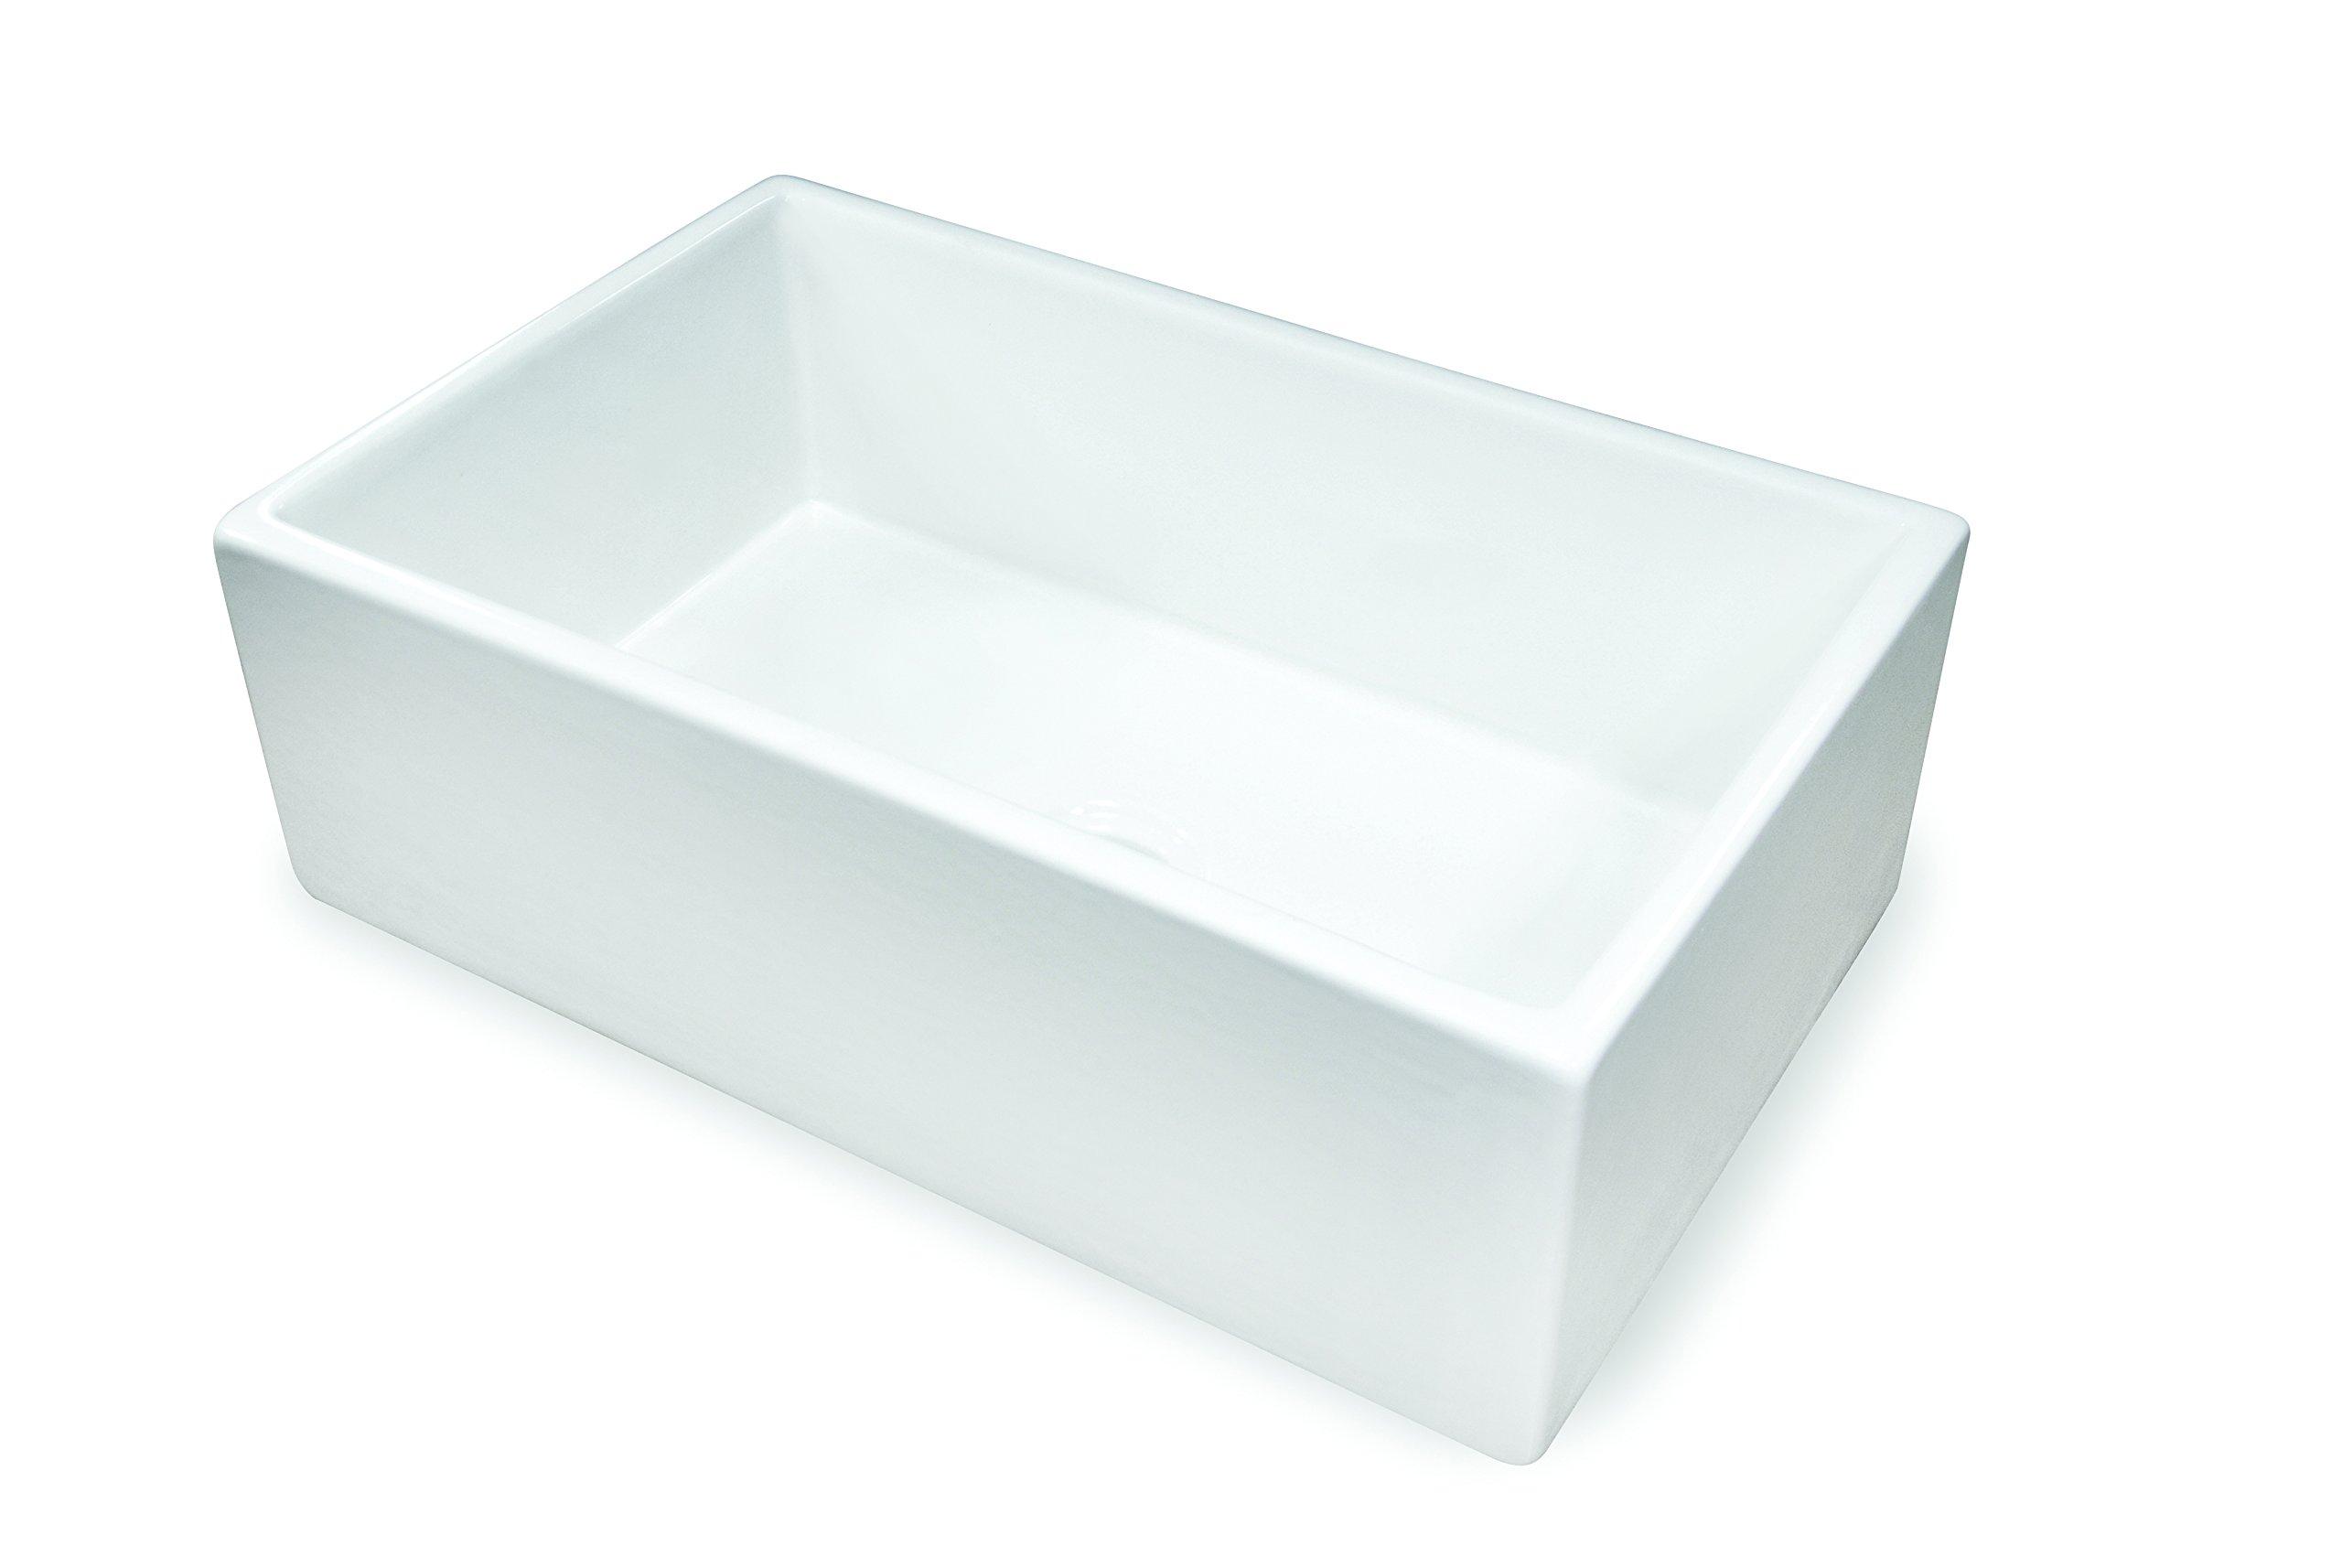 TRUE FIRECLAY Treillage Sink by MOCCOA, Reversible Apron Front Sink 30 Farmhouse Sink White